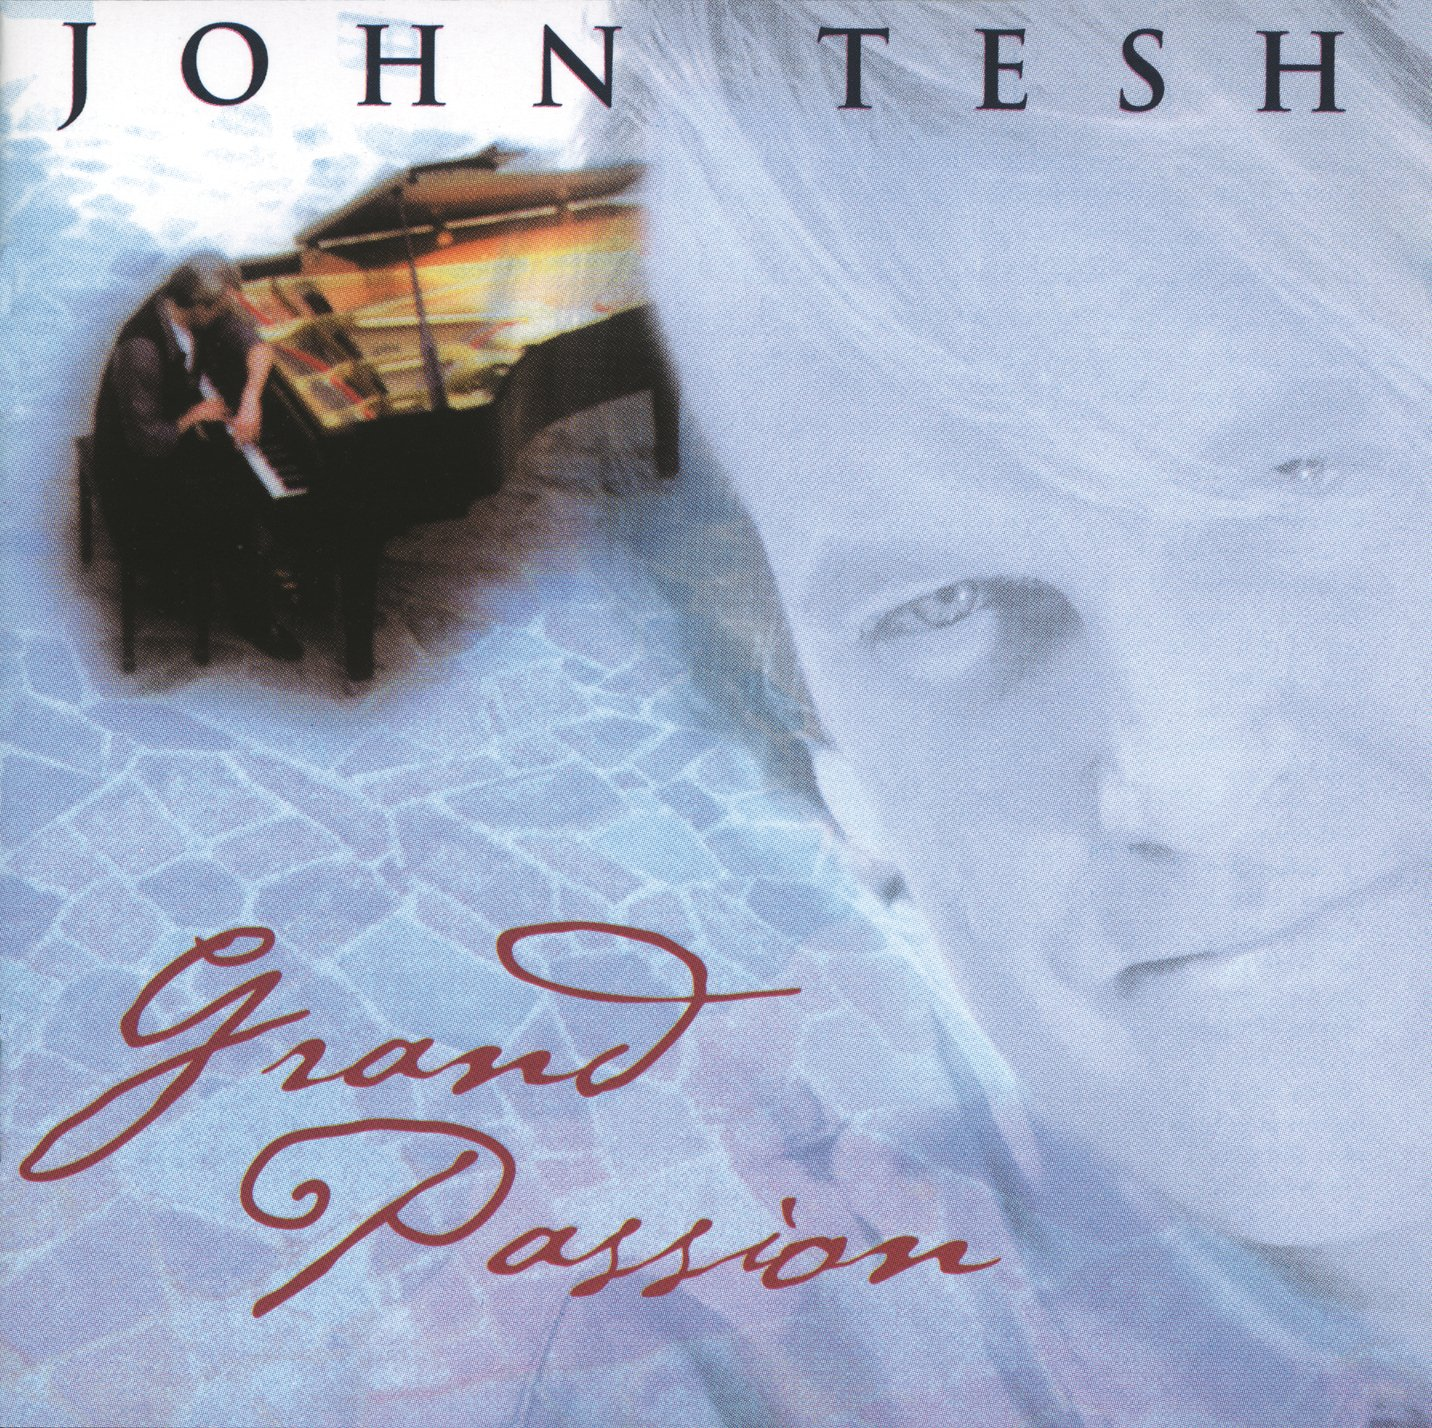 John Tesh – Grand Passion (1998) [FLAC]